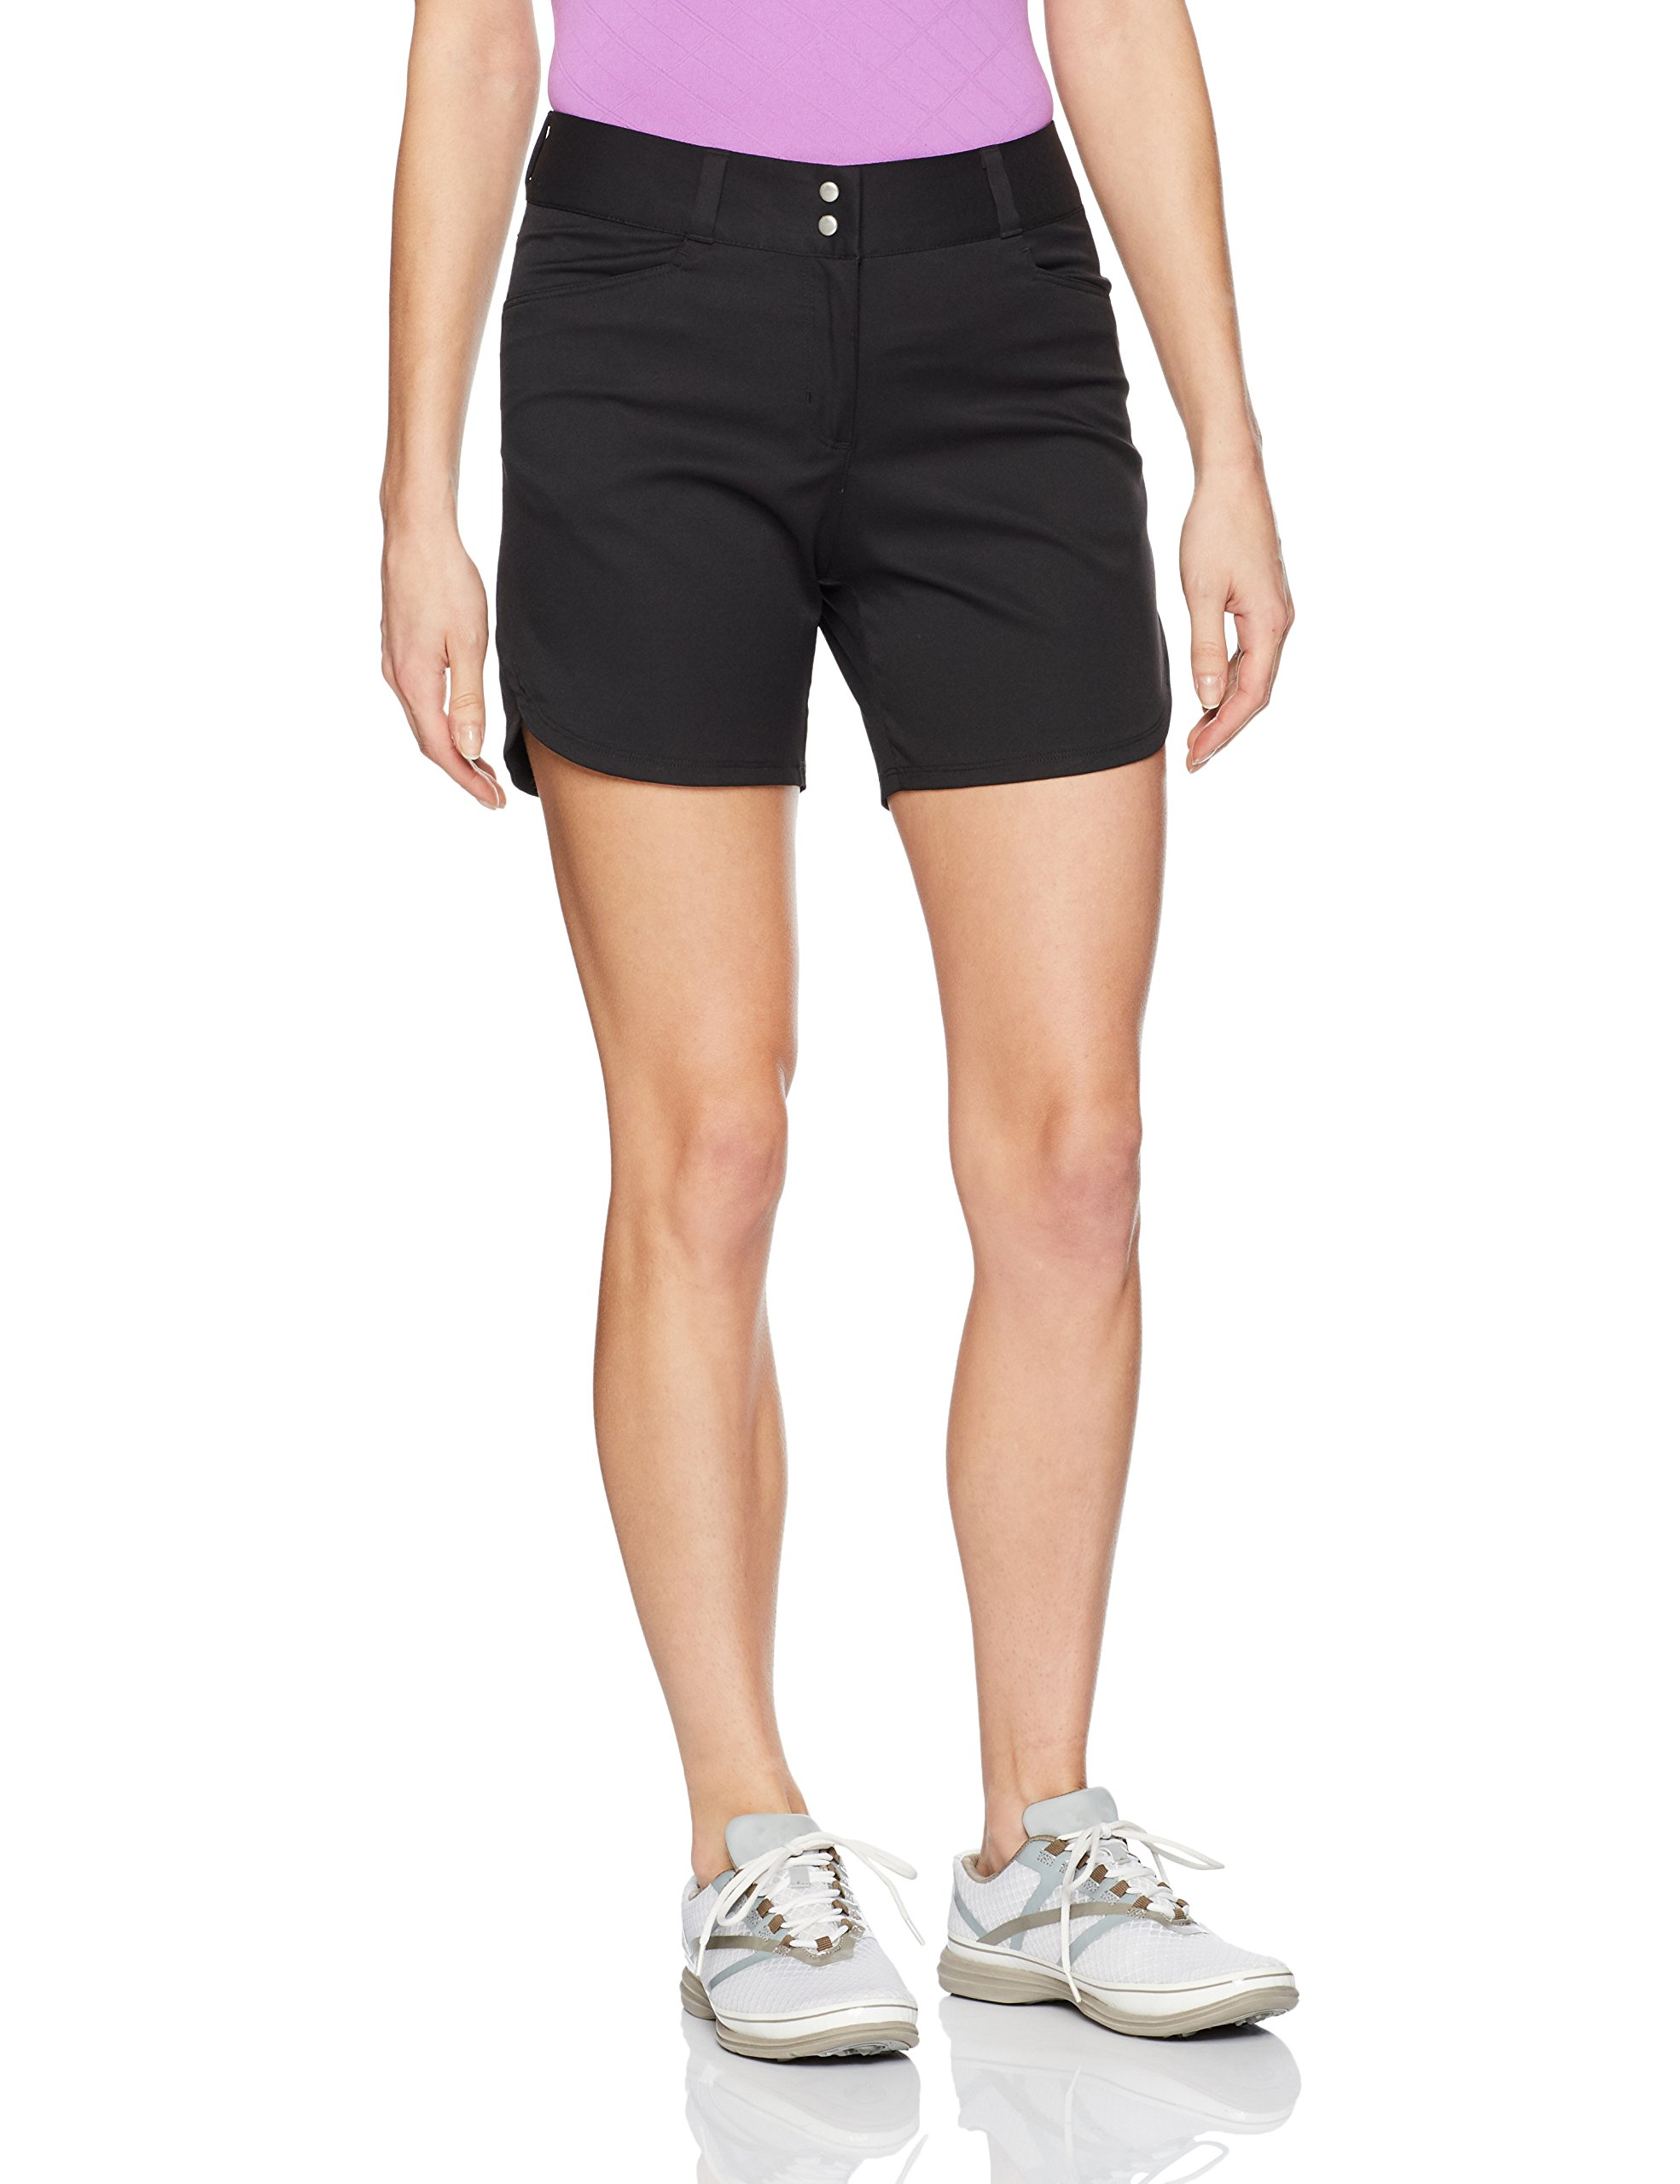 adidas Golf Women's Essential 5'' Shorts, Size 8, Black